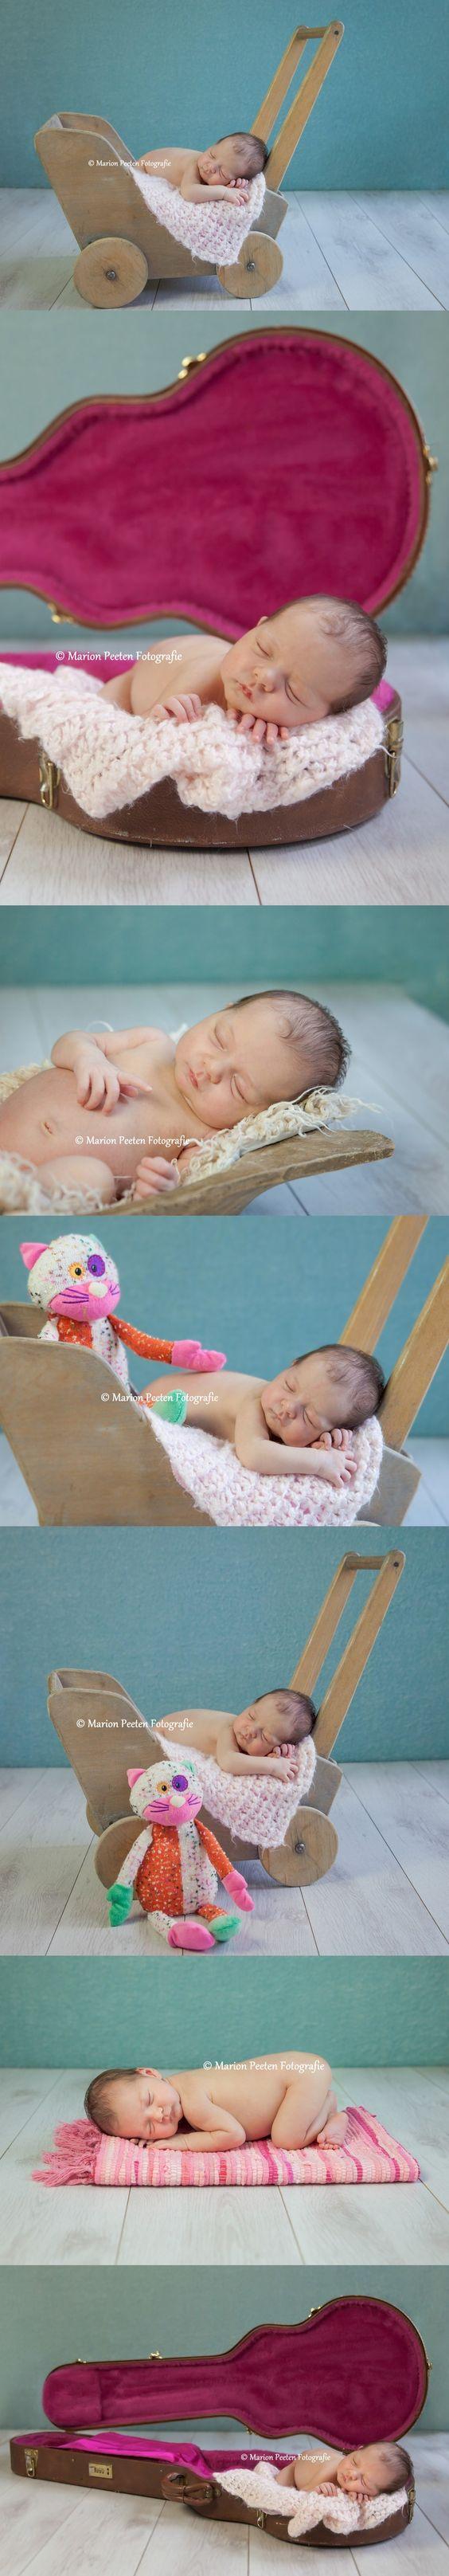 Newborn fotografie Limburg, studio fotografie.Newborn in gitaarkoffer. Newborn in guitar case .